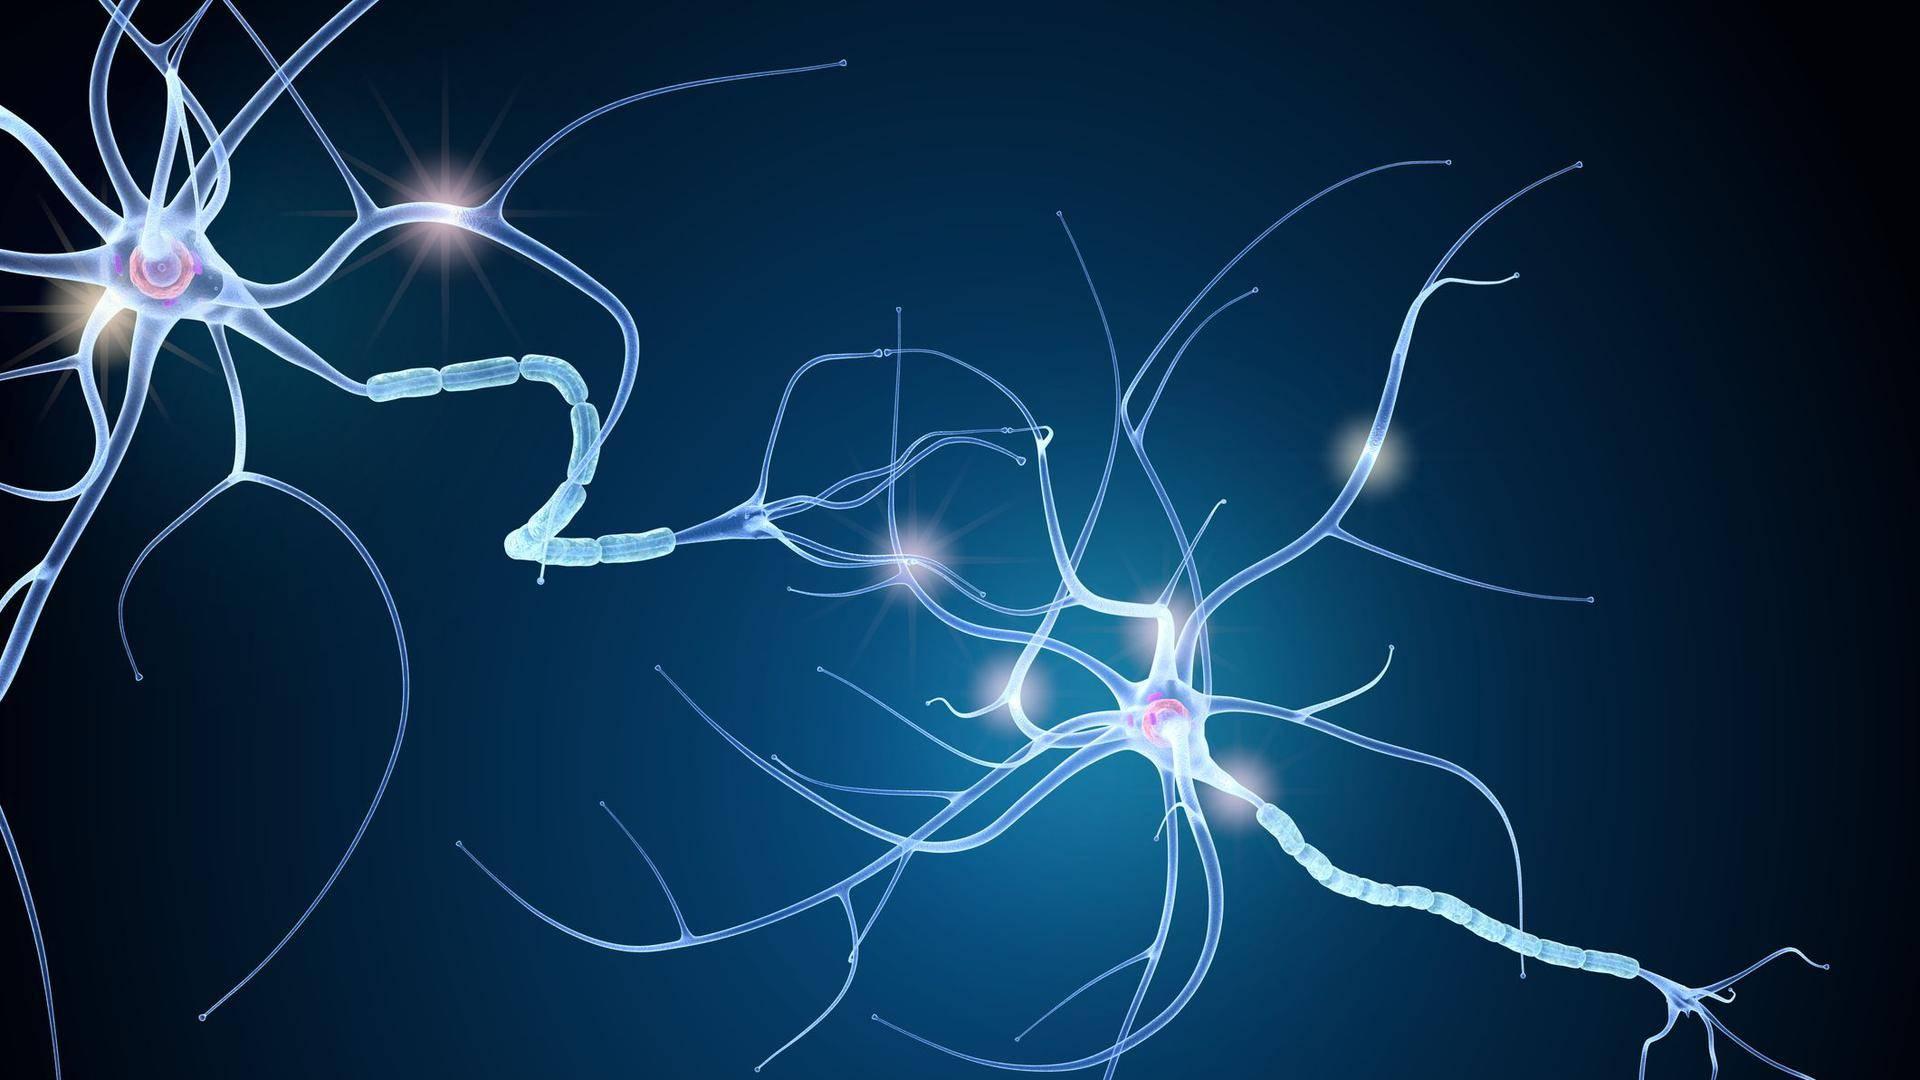 neuron-1920-1080